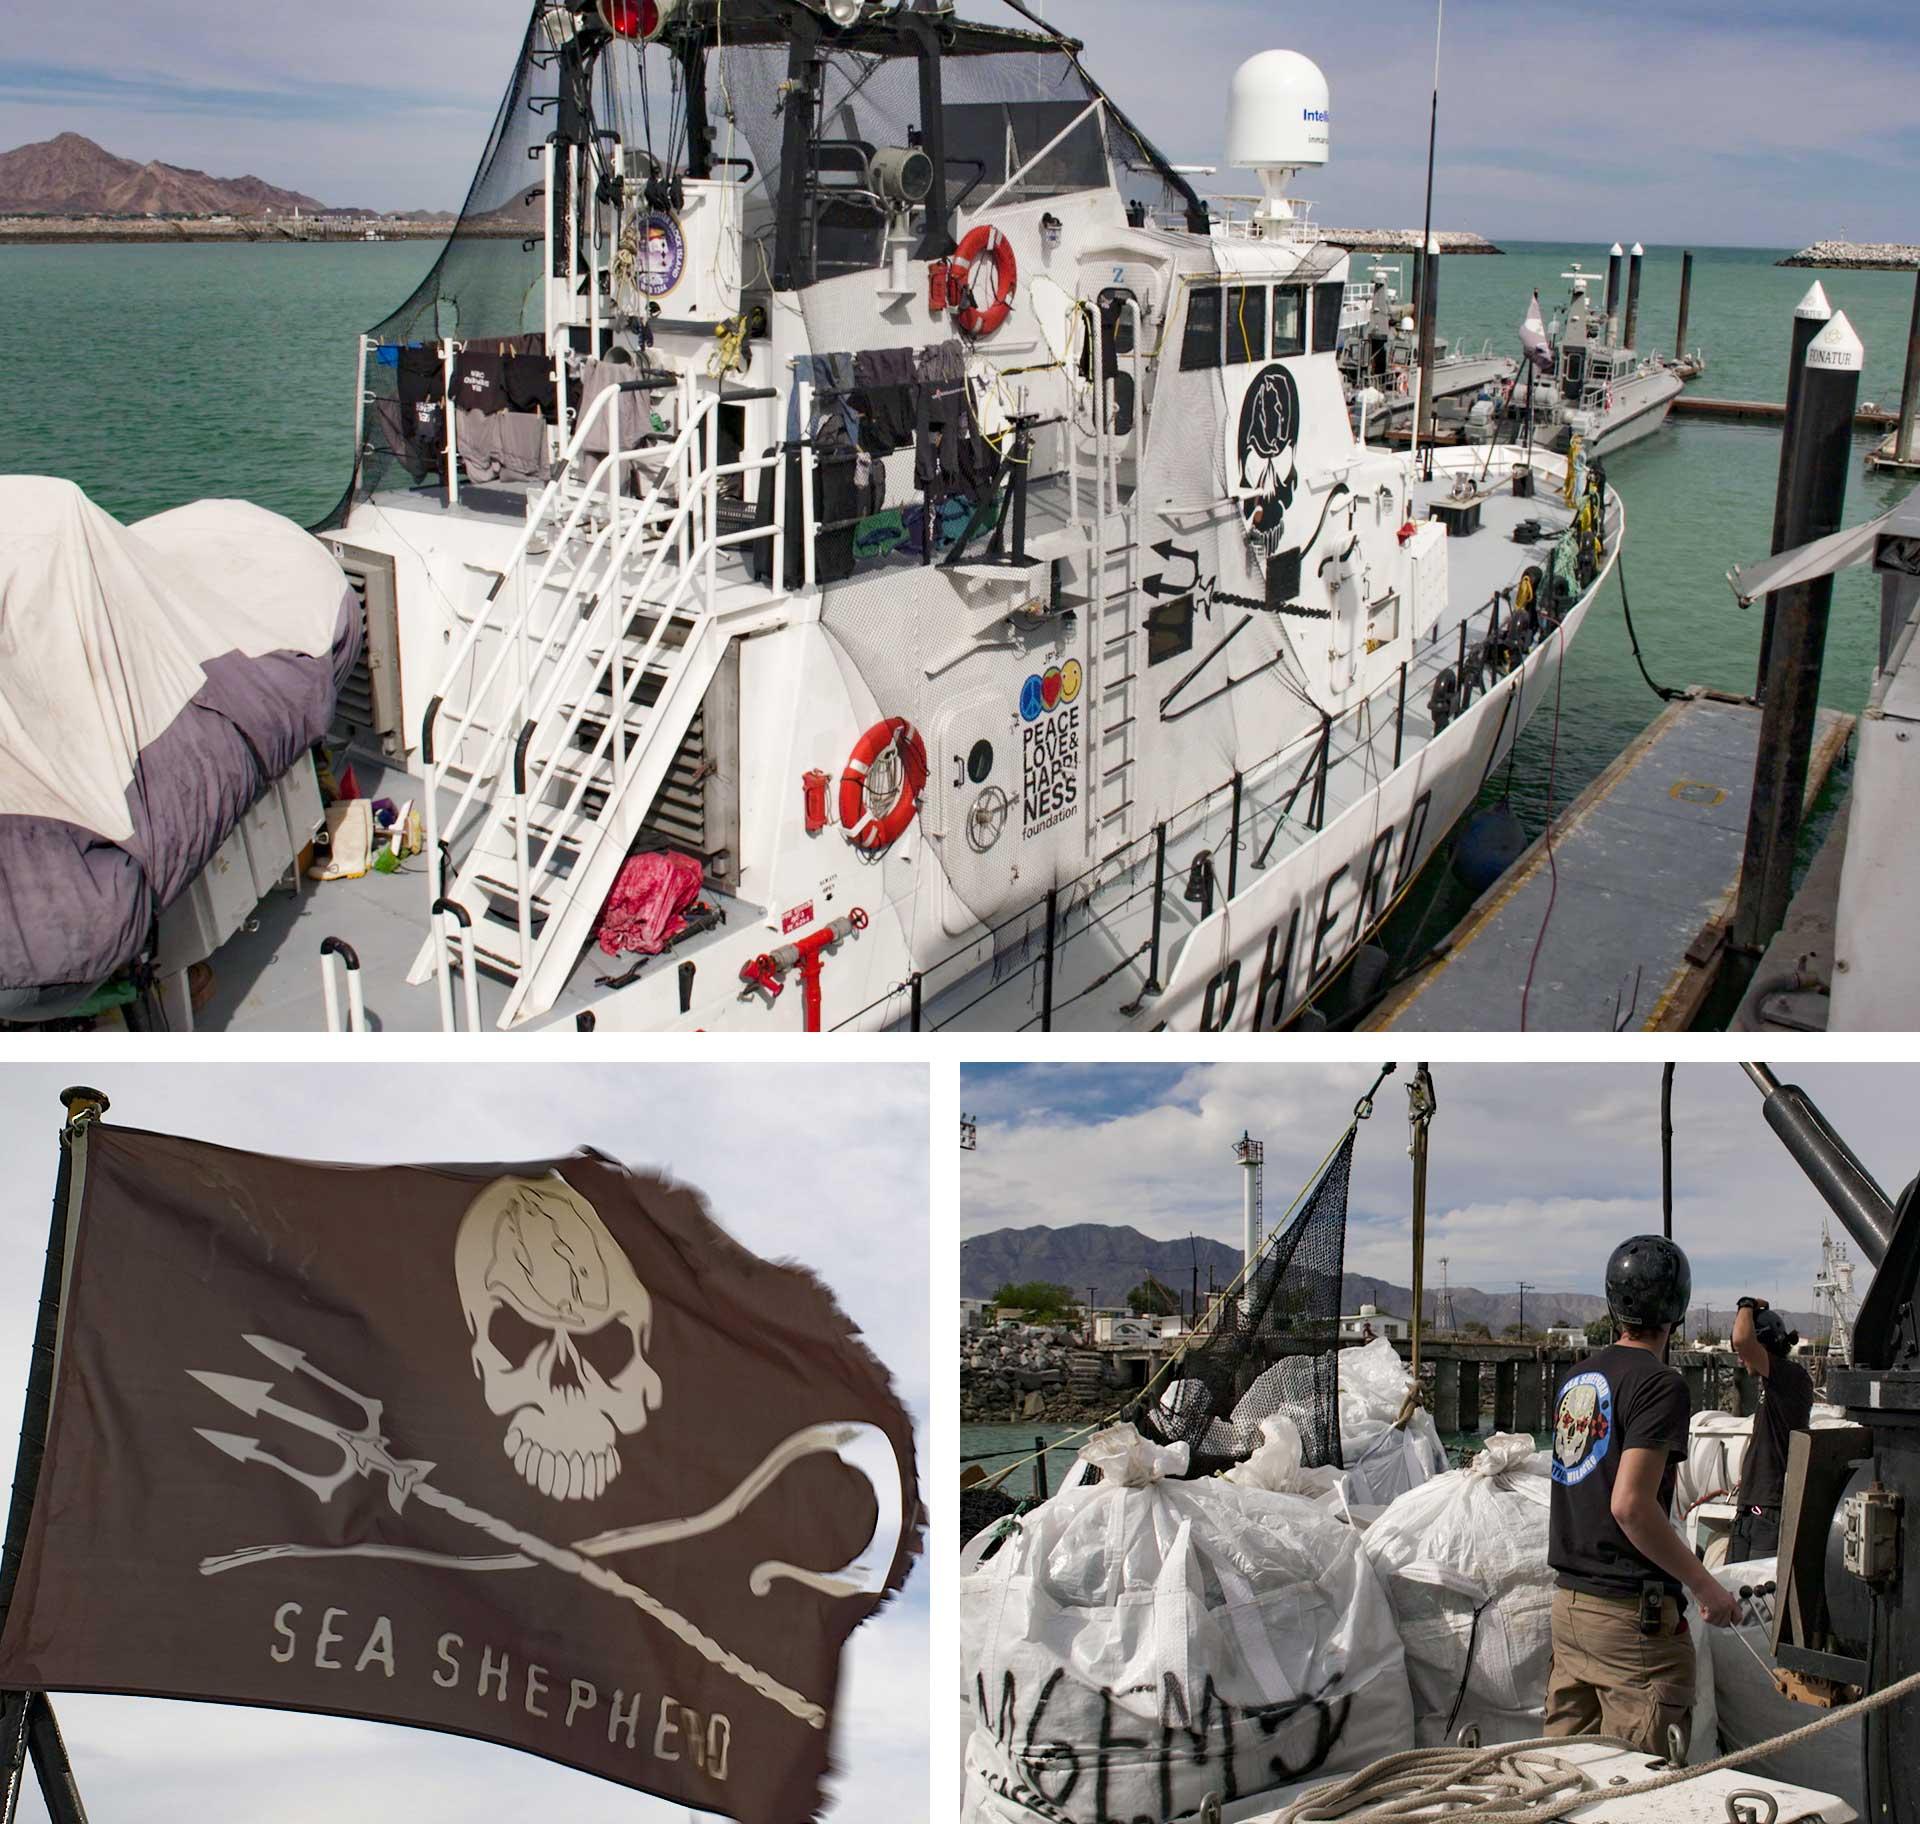 Sea Shepherd's Farley Mowat ship.